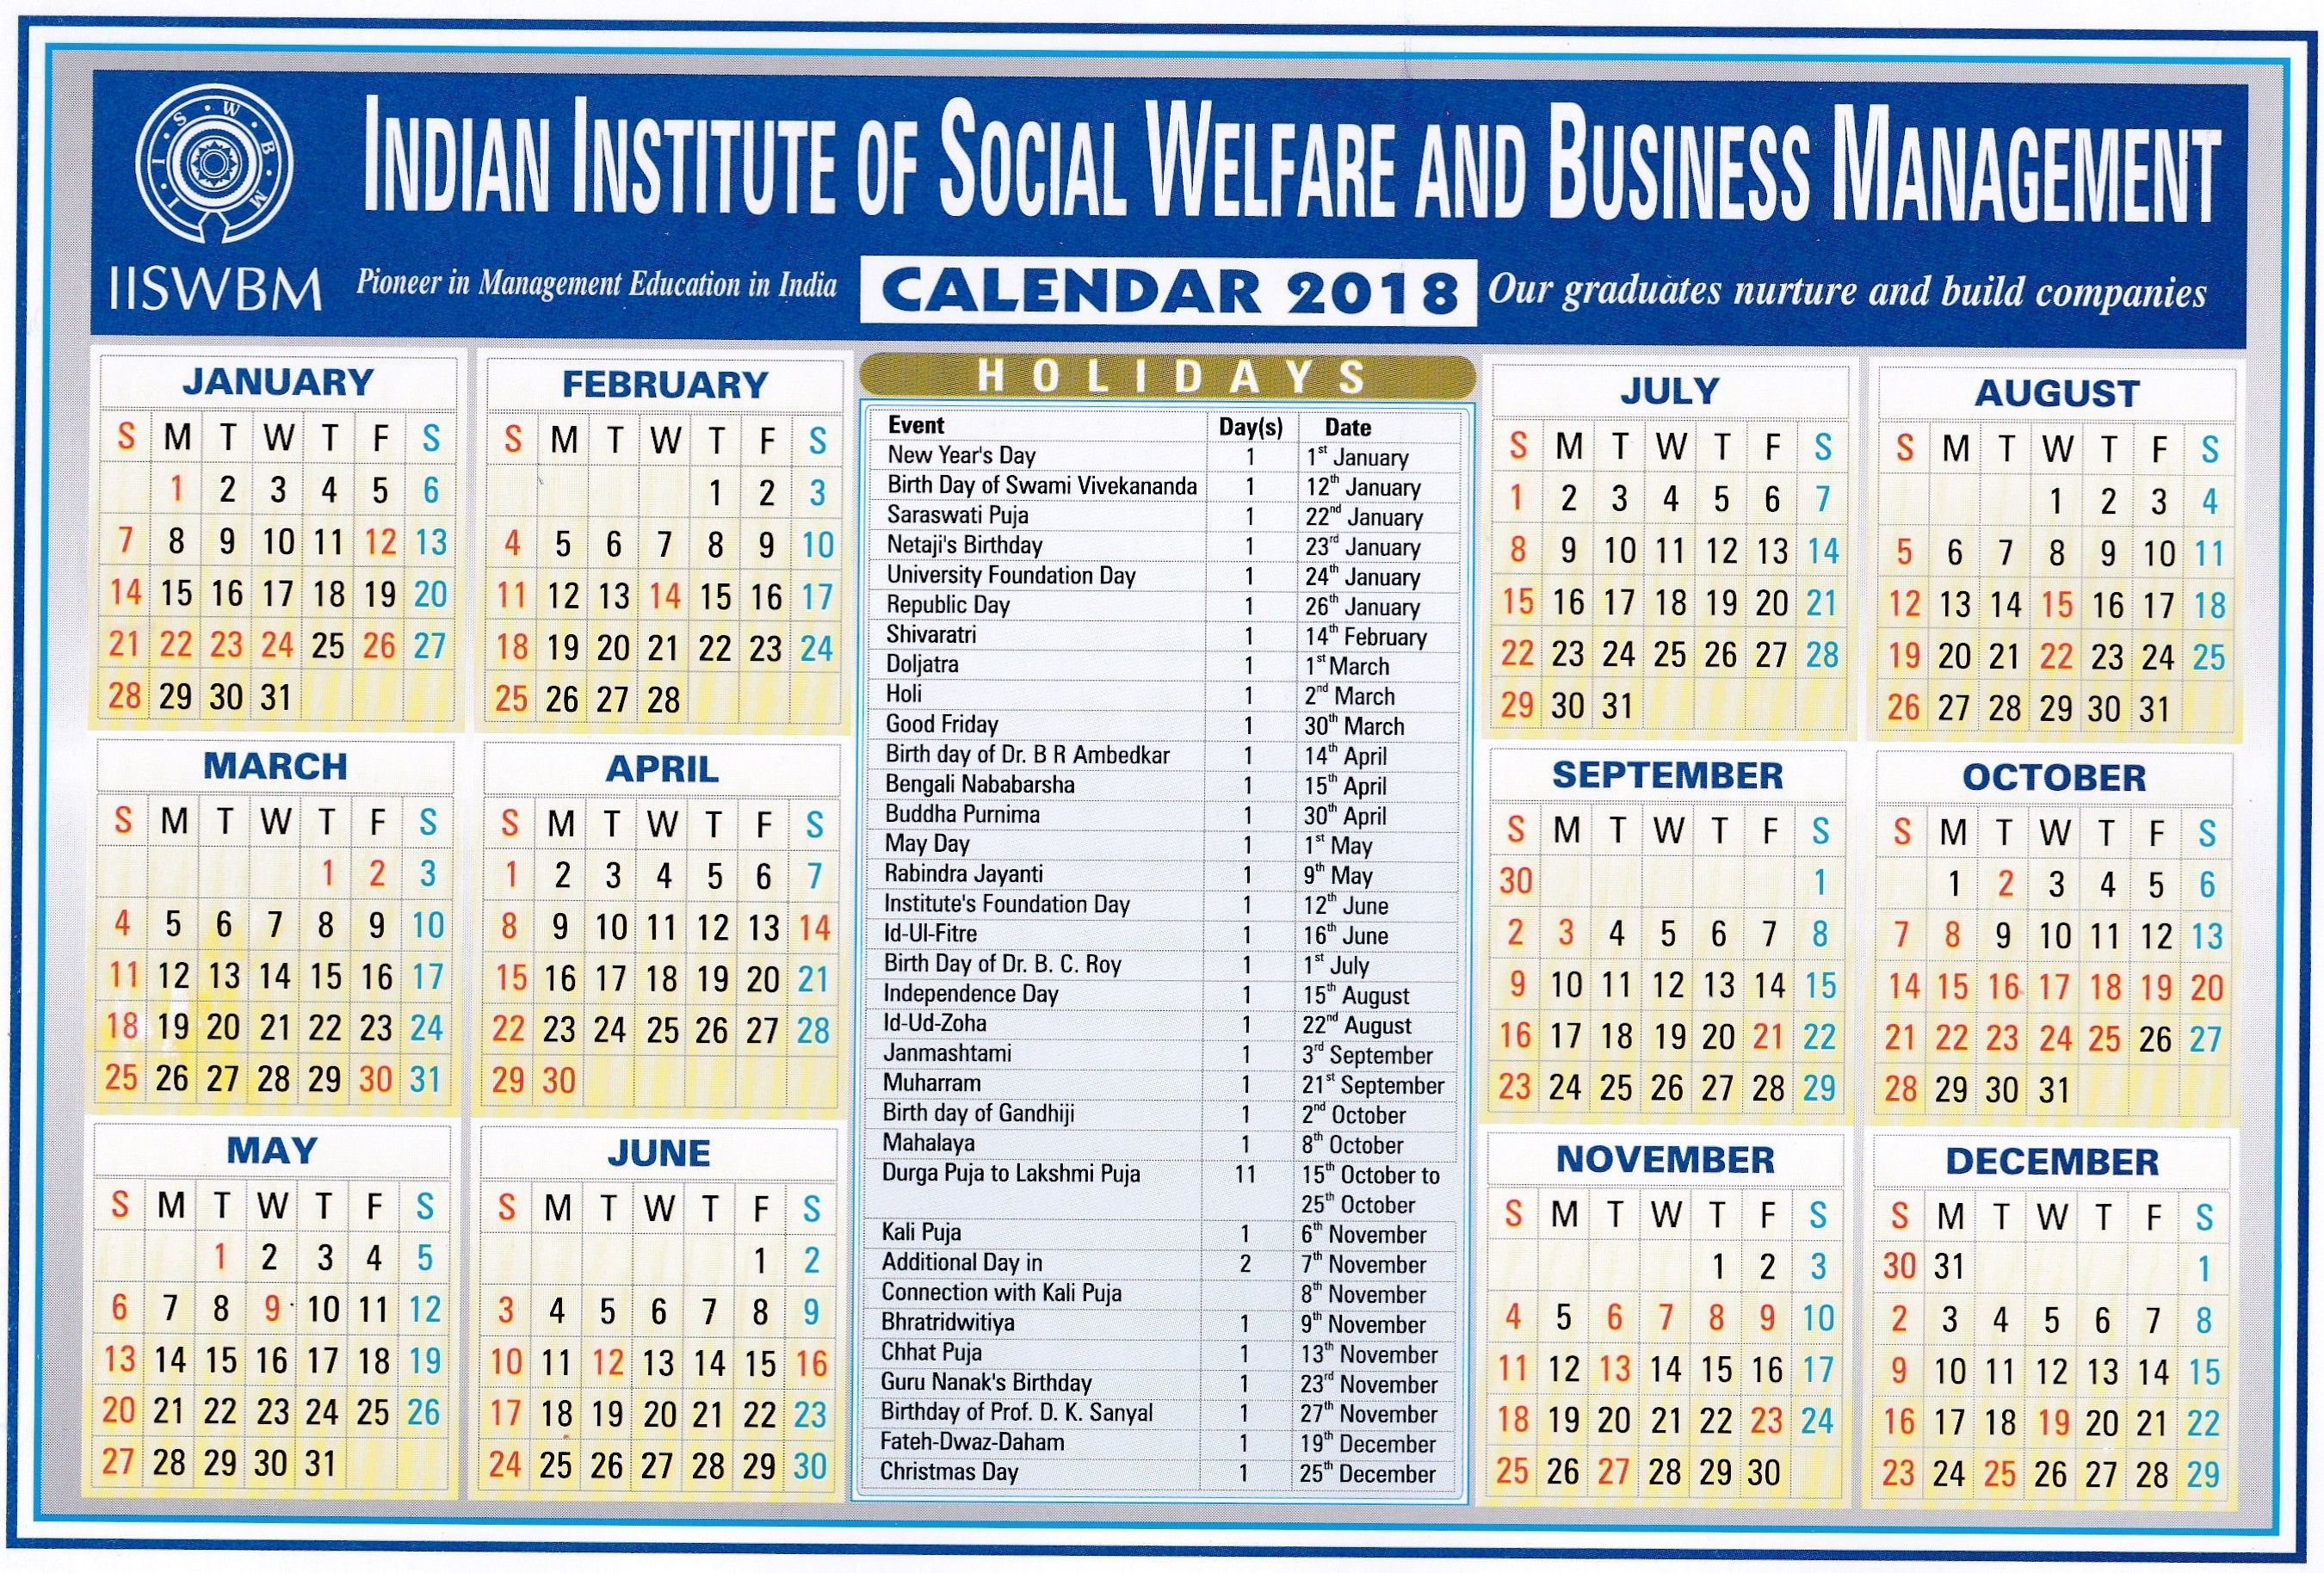 April 2019 Hindu Calendar Iiswbm Calendar Online 2019 Free Check